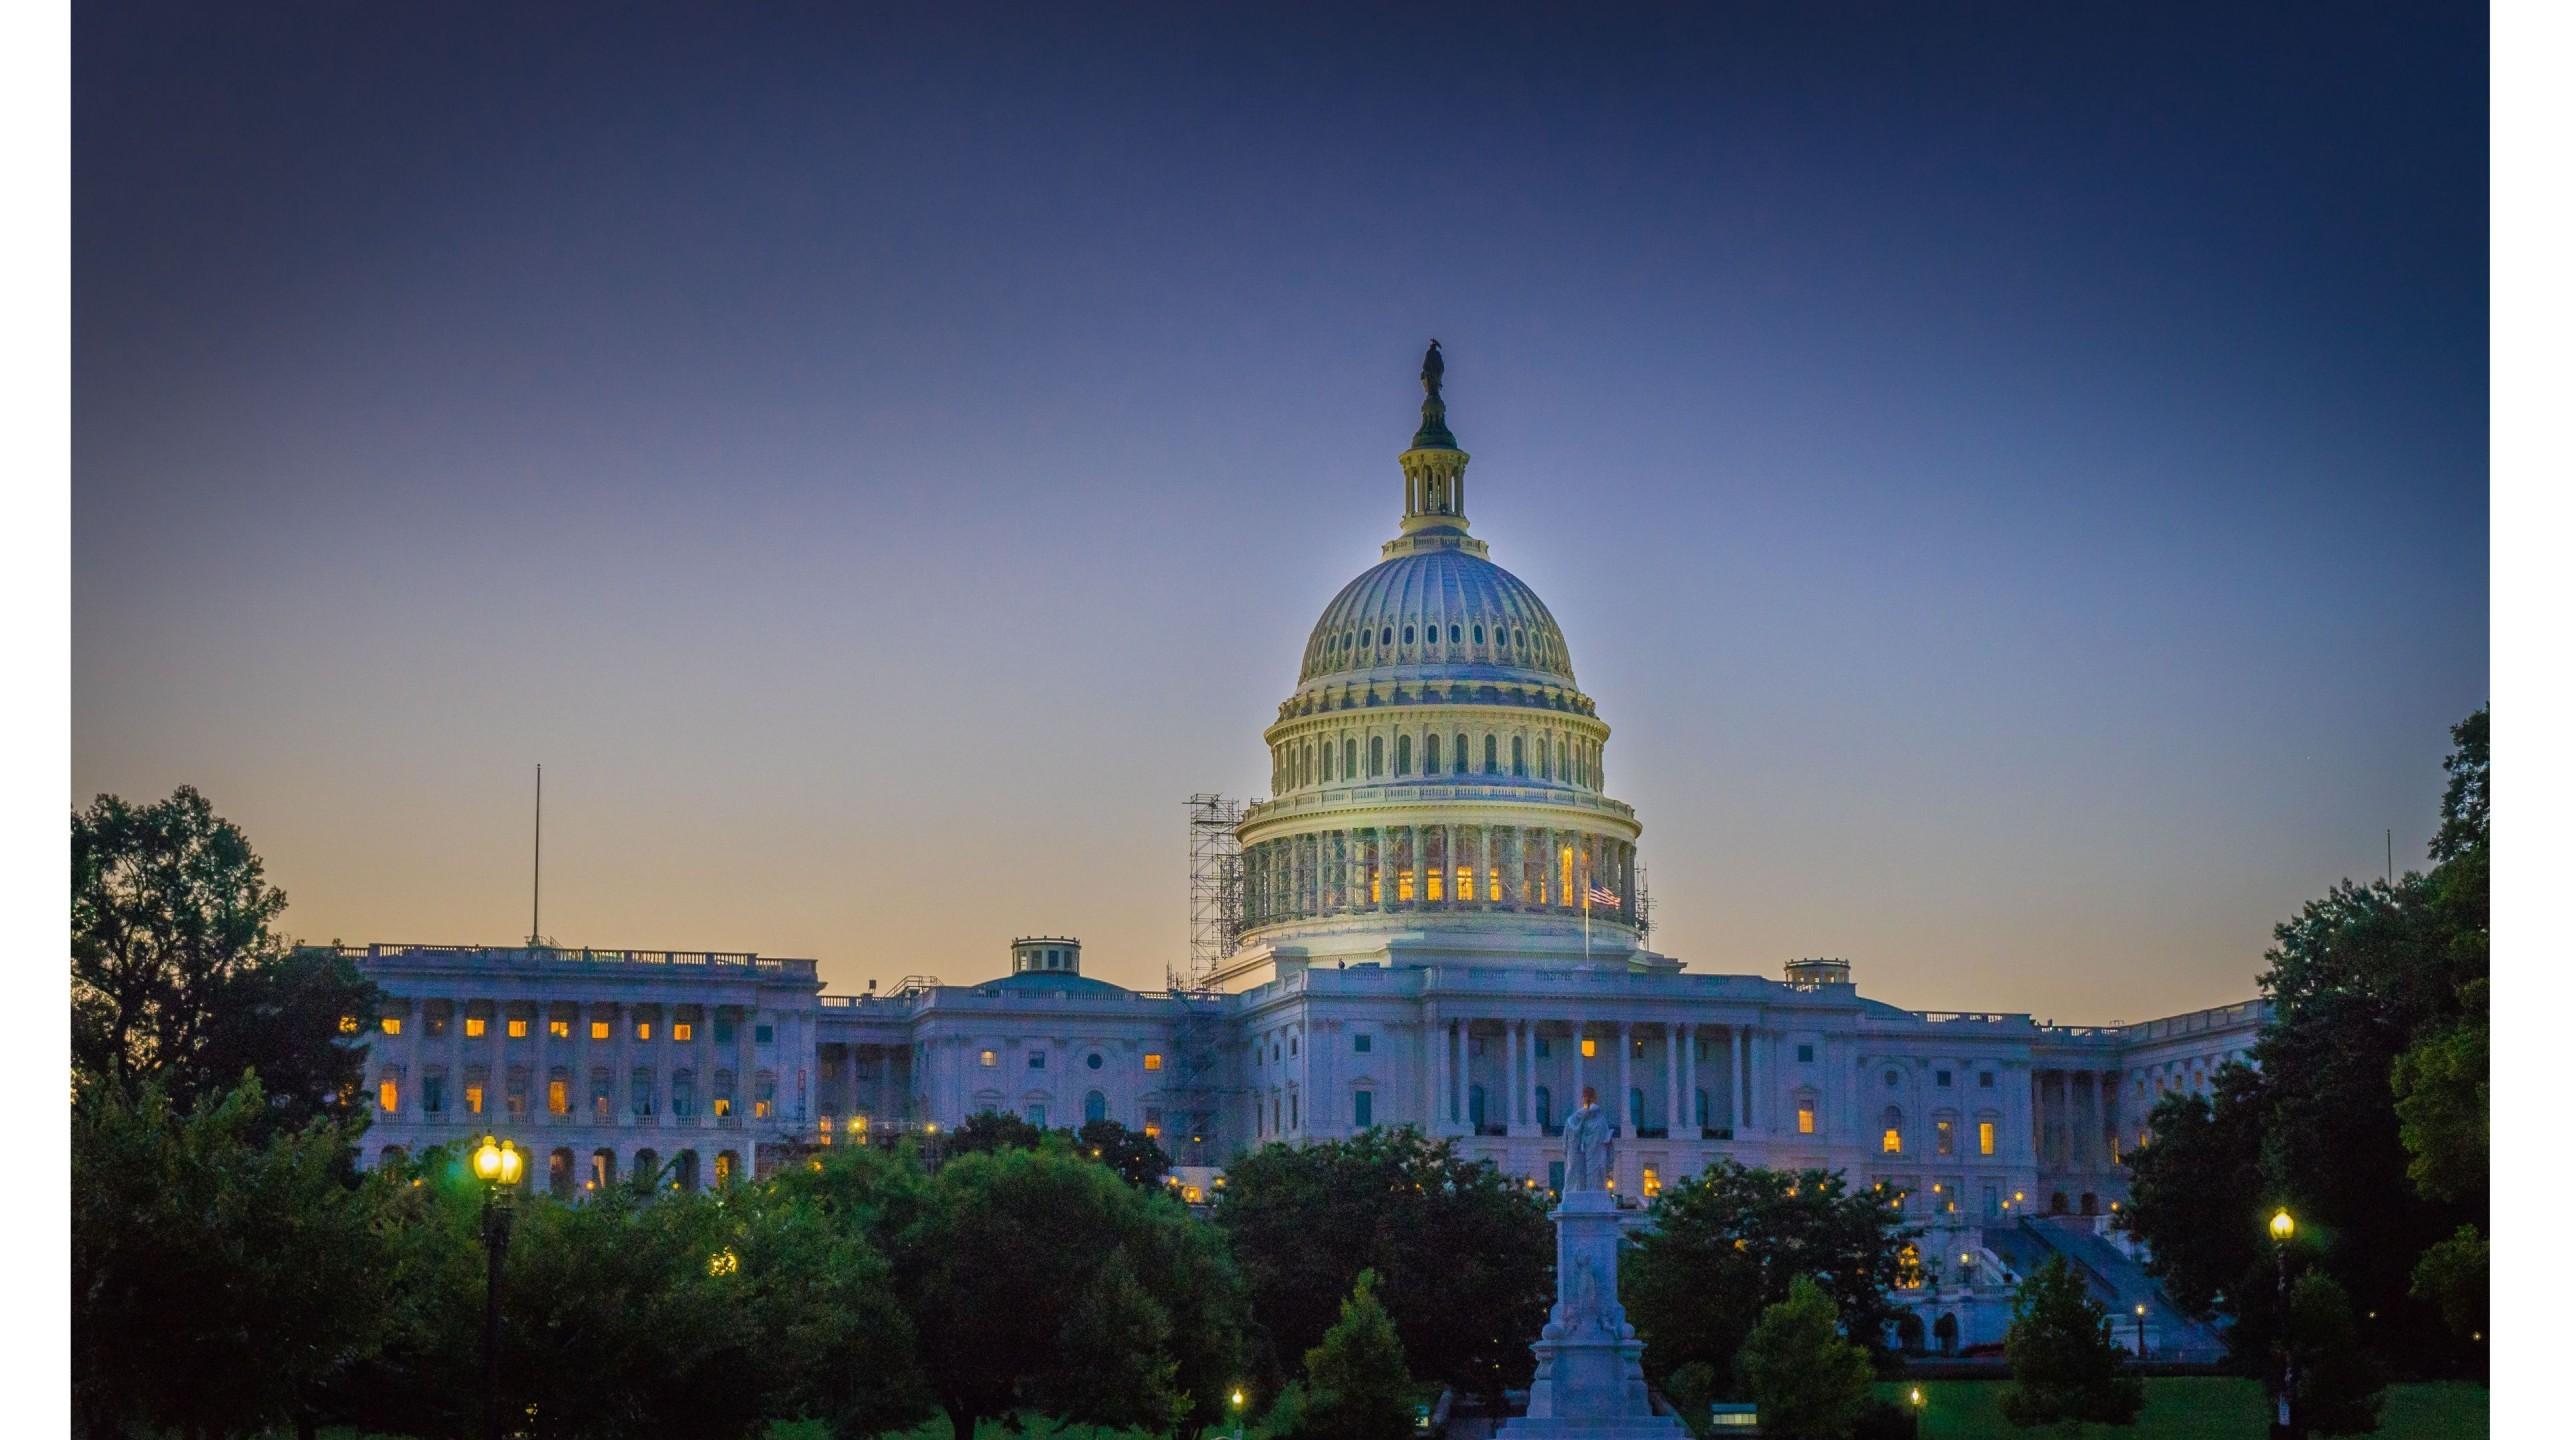 Amazing 2016 Washington DC 4K Wallpaper | Free 4K Wallpaper